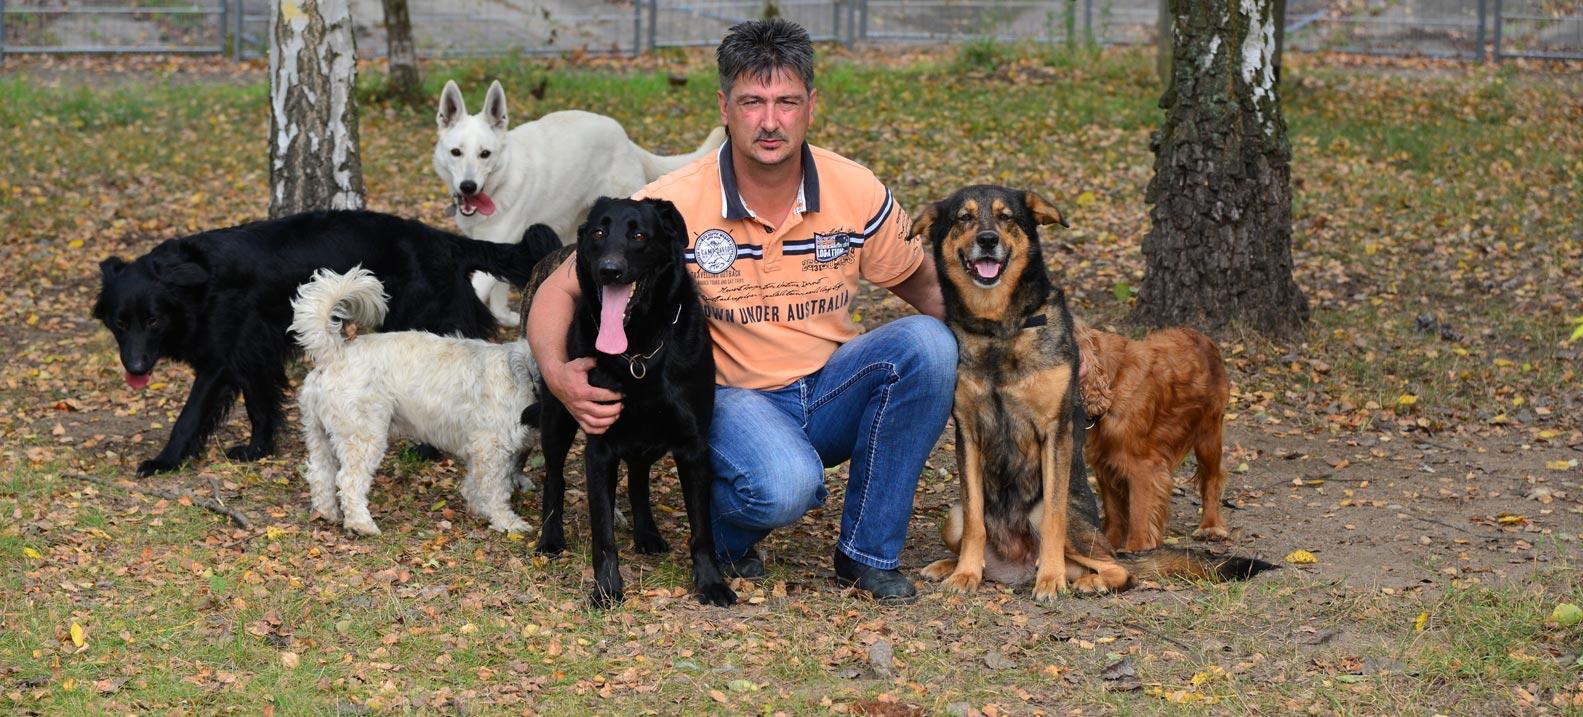 Tierheim Frankfurt Oder Hunde